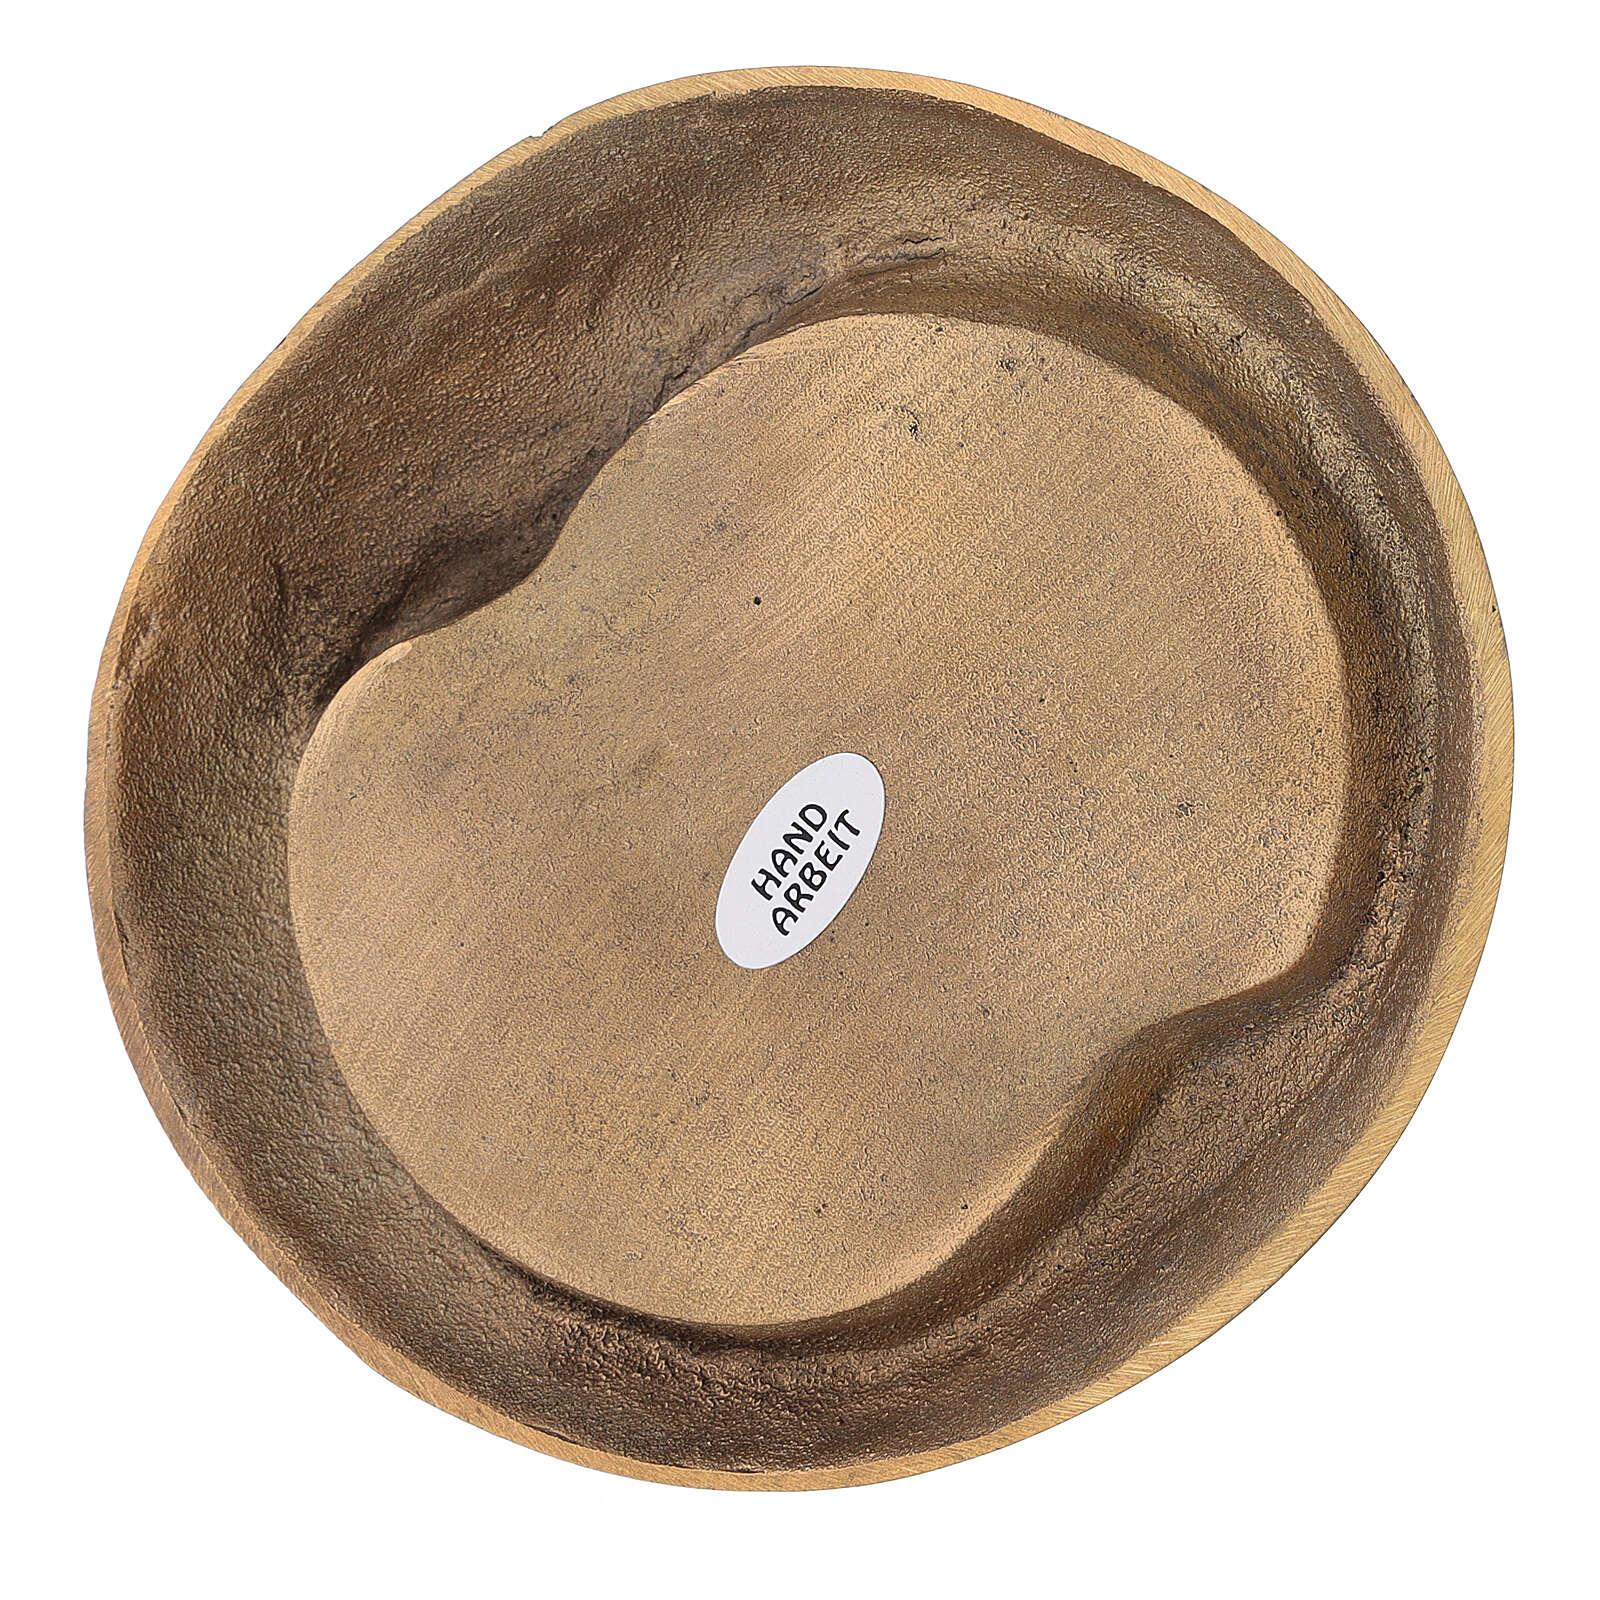 Plato portavela doble ovalado latón dorado satinado 3